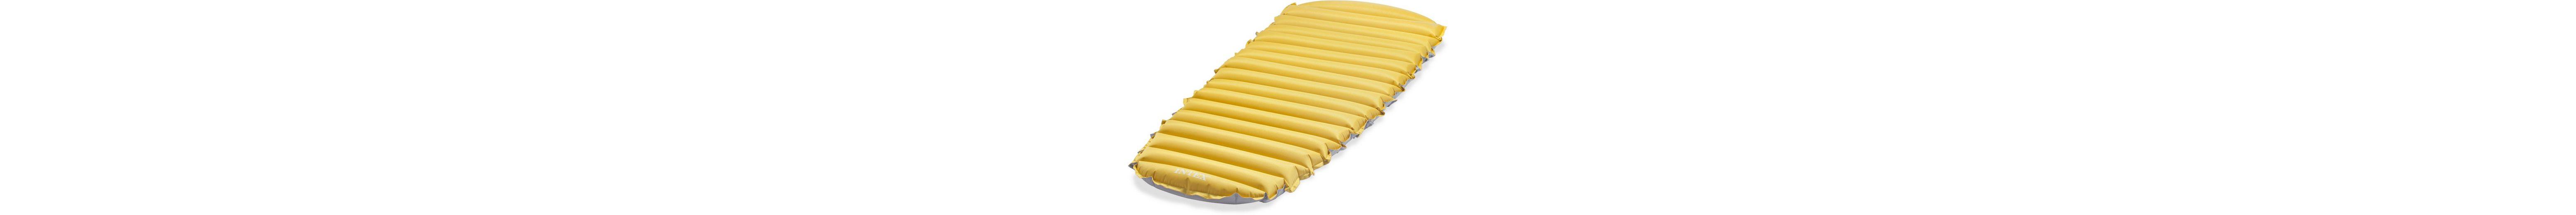 Intex Camping Matratze, 183/76/10 cm, gelb-grau, »Cot Size Camp Bed«